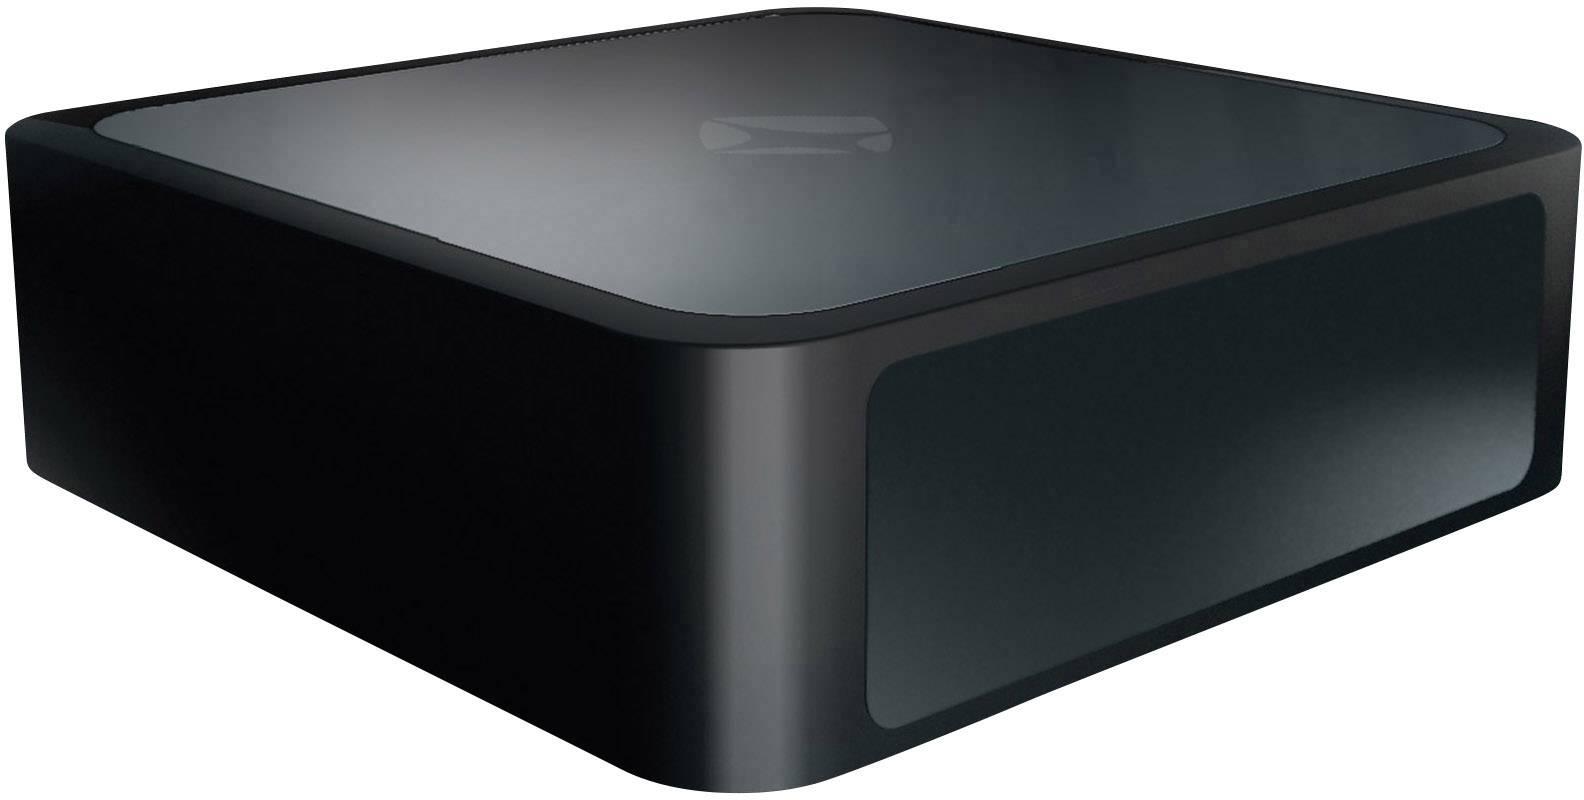 Centrální jednotka Smart Home Gateway V4 Mediola(R) AIO